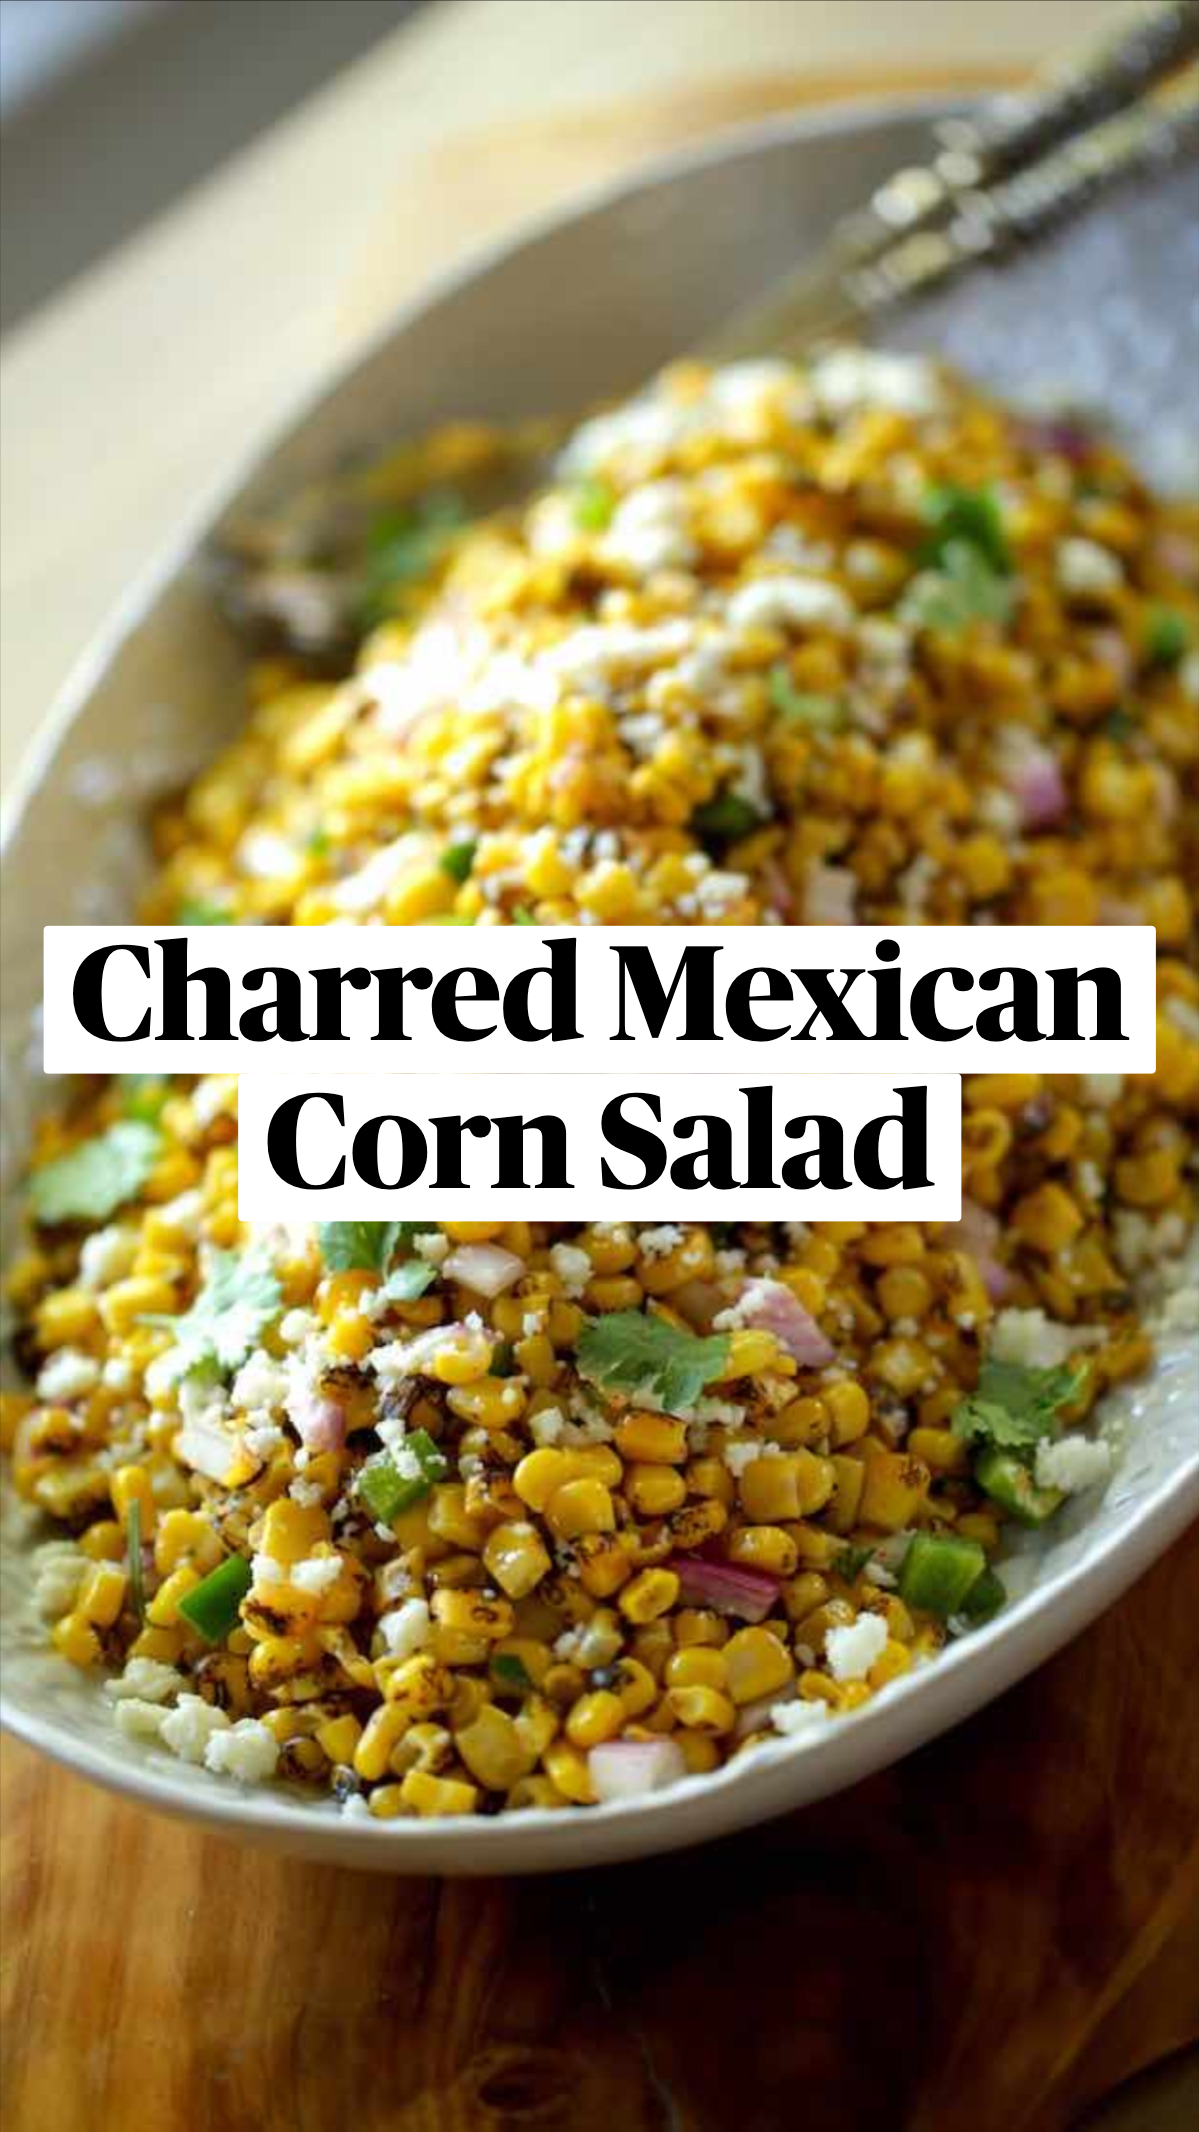 Charred Mexican Corn Salad